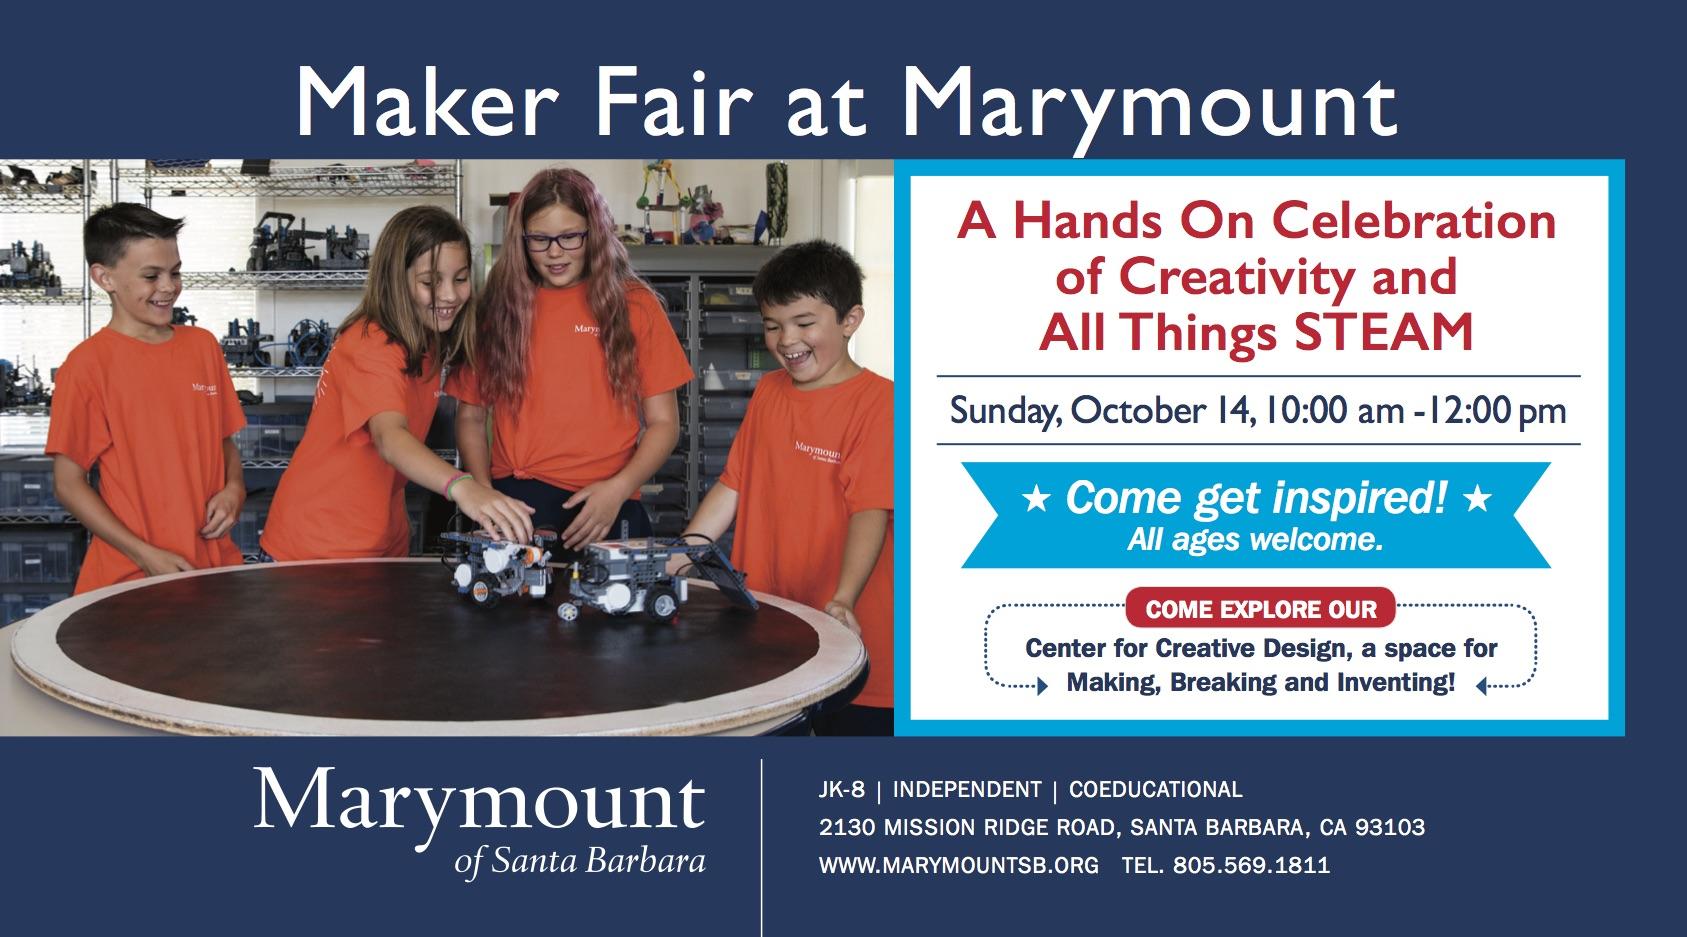 MakerFairfront18-copy.jpg